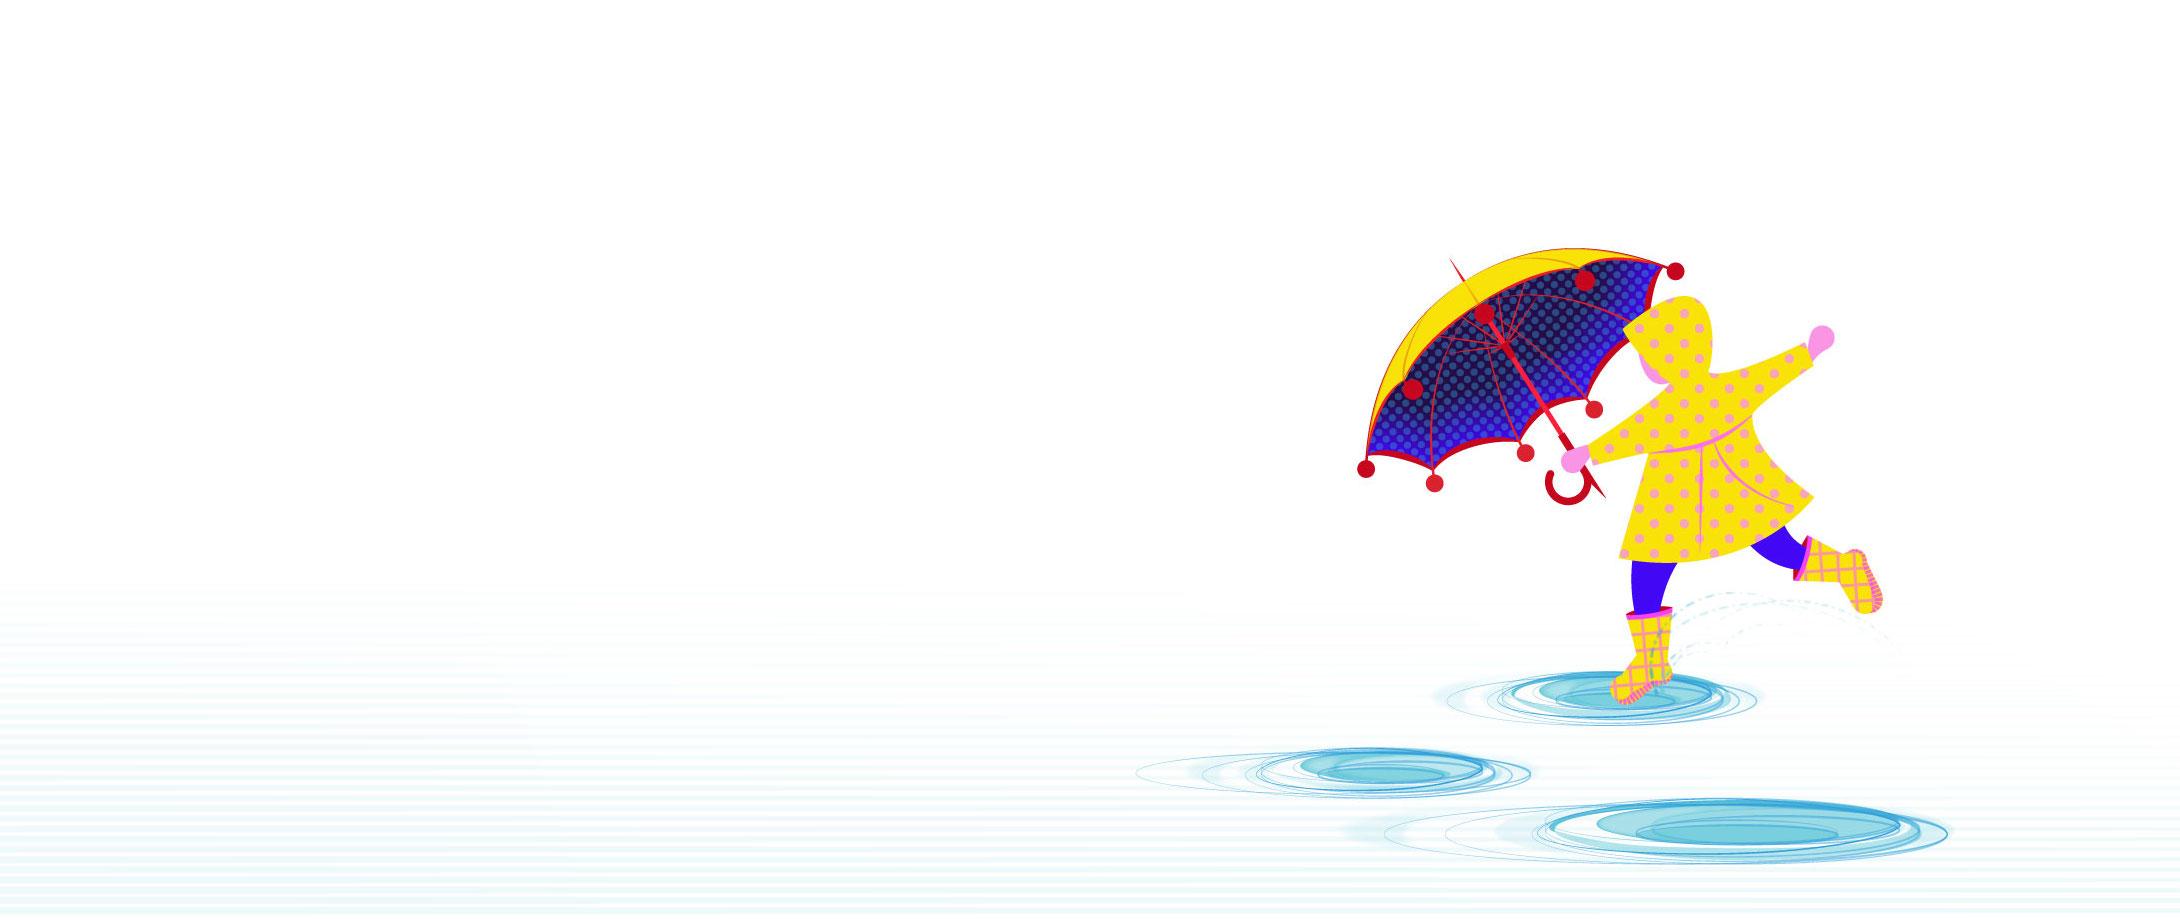 Aditi Raychoudhury. Rain! Rain, Come my way! I want to puddle hop ALL day! 2015. Adobe Illustrator.